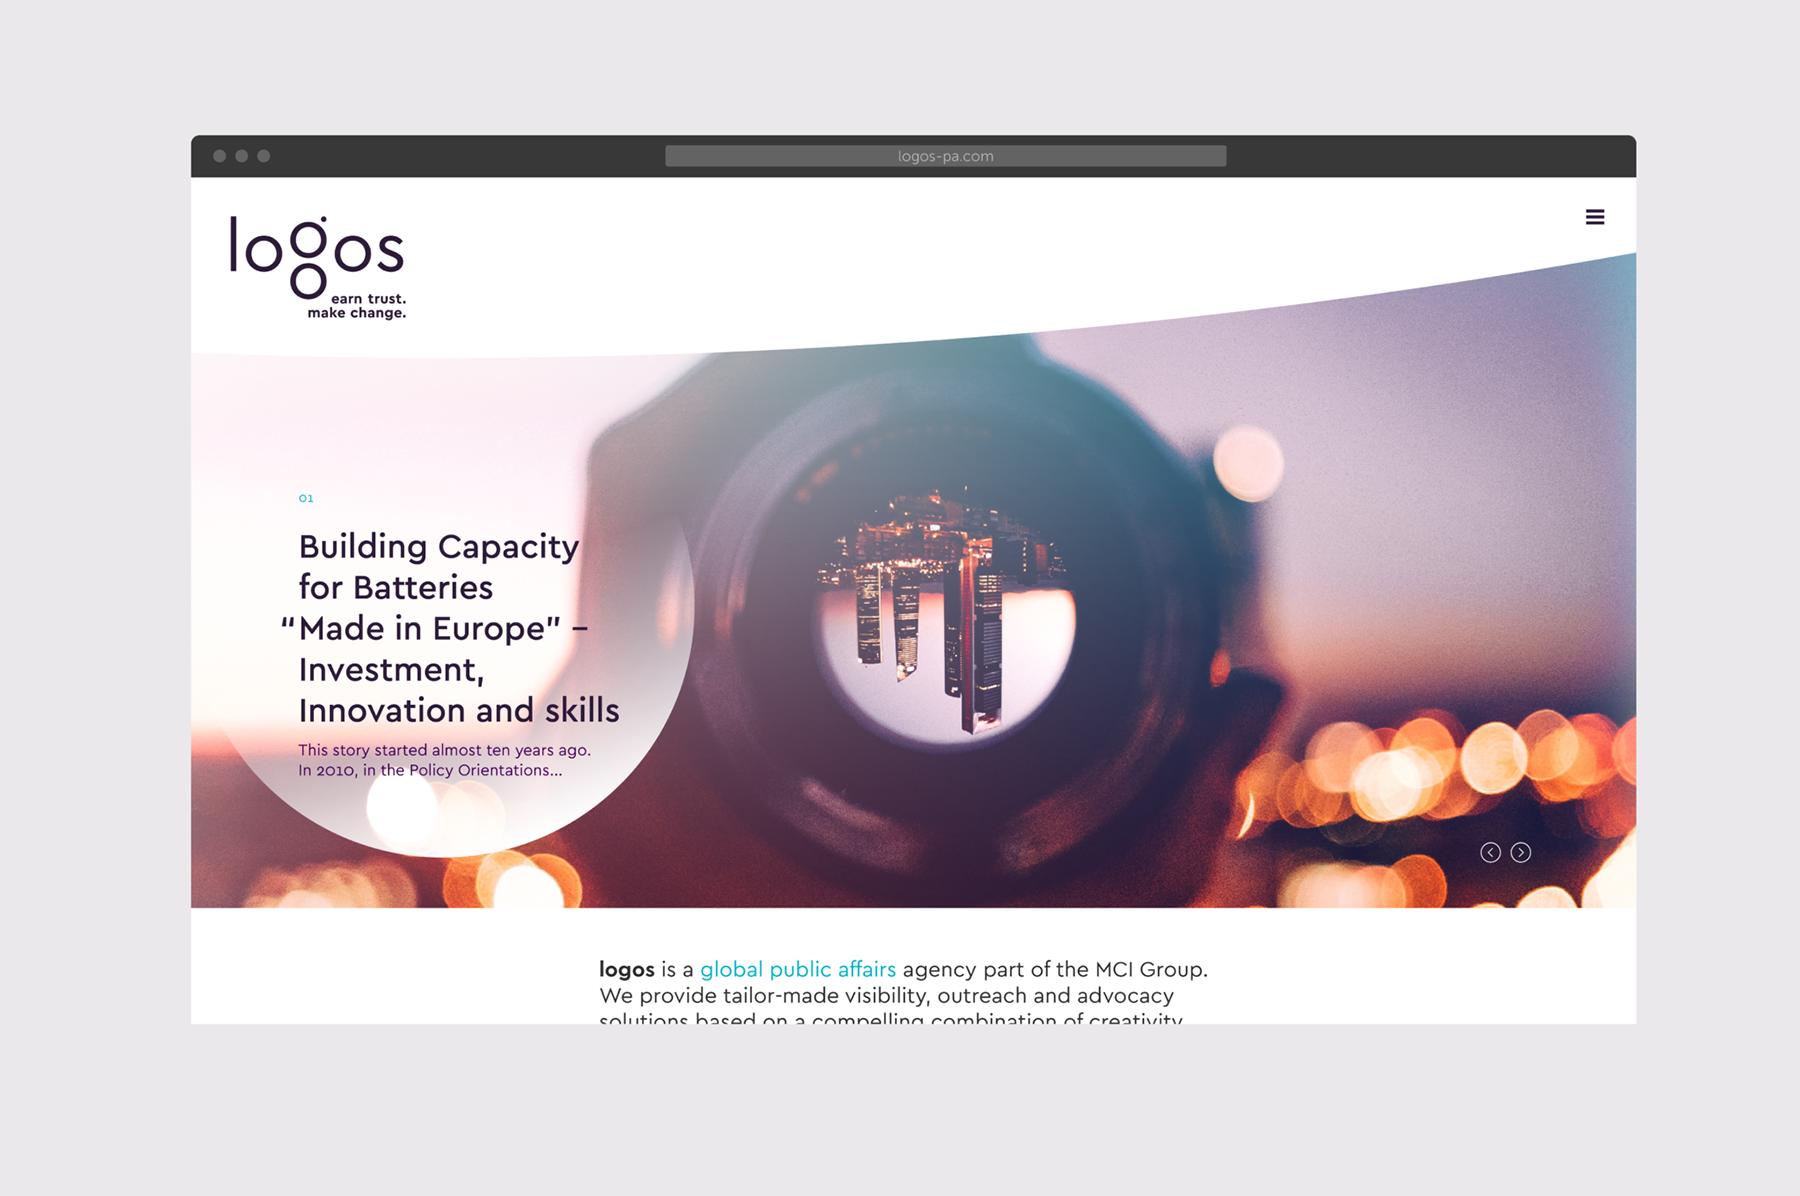 logos website desktop